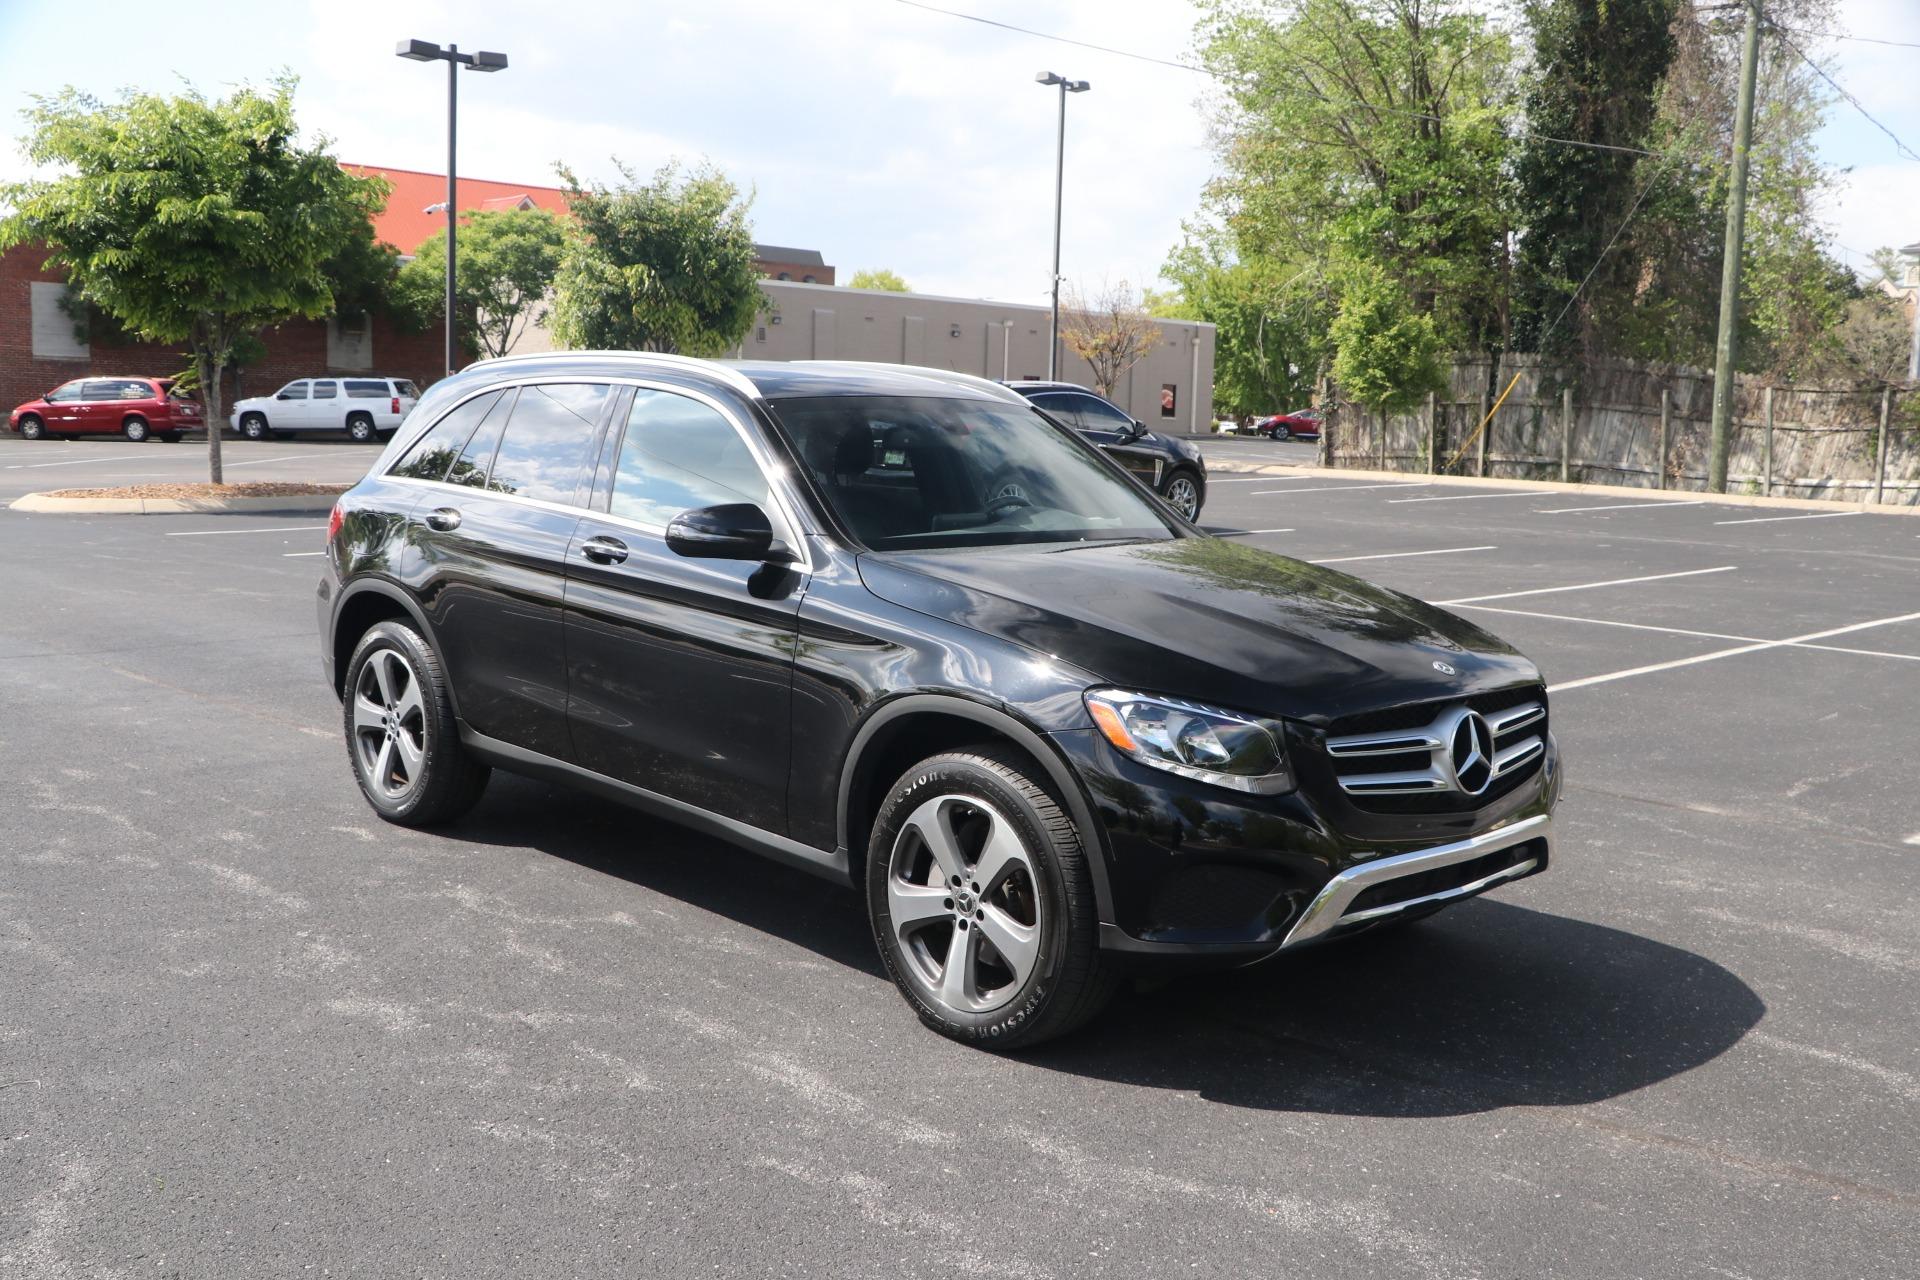 Used 2019 Mercedes-Benz GLC 300 PREMIUM W/NAV for sale Sold at Auto Collection in Murfreesboro TN 37130 1